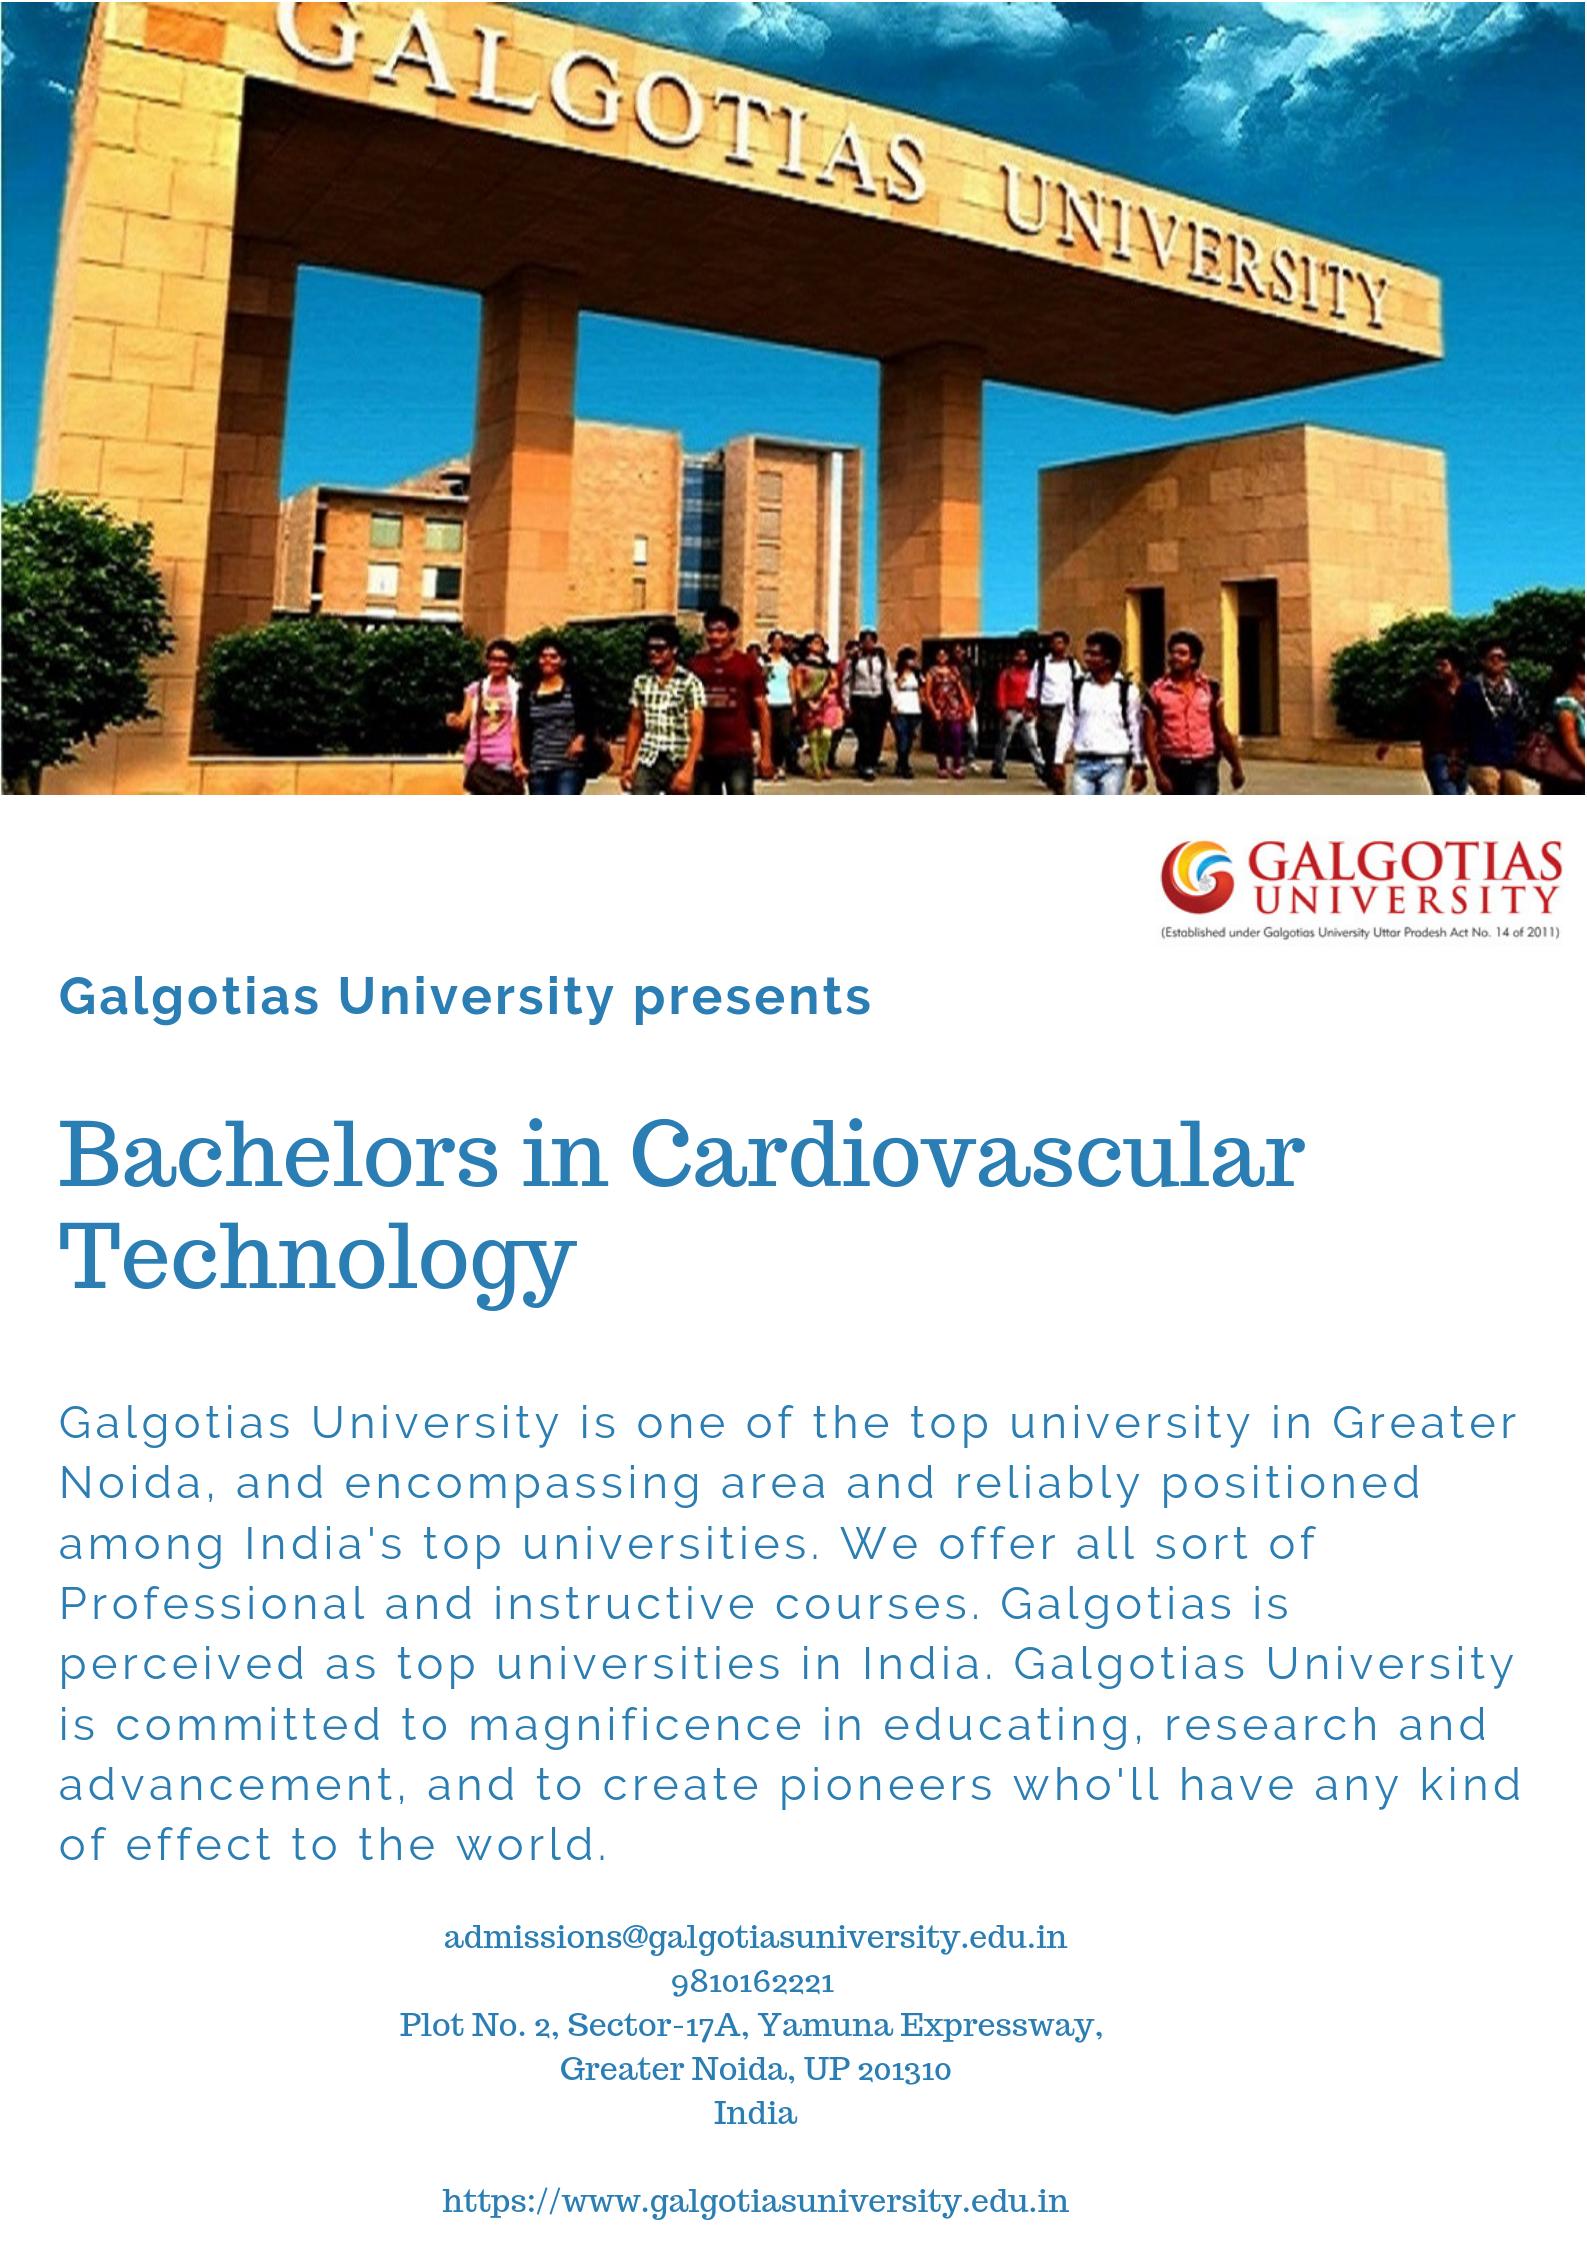 B Sc Cardiac Technology Course Galgotias University Effective Communication Skills Interpersonal Communication Skills Cardiovascular